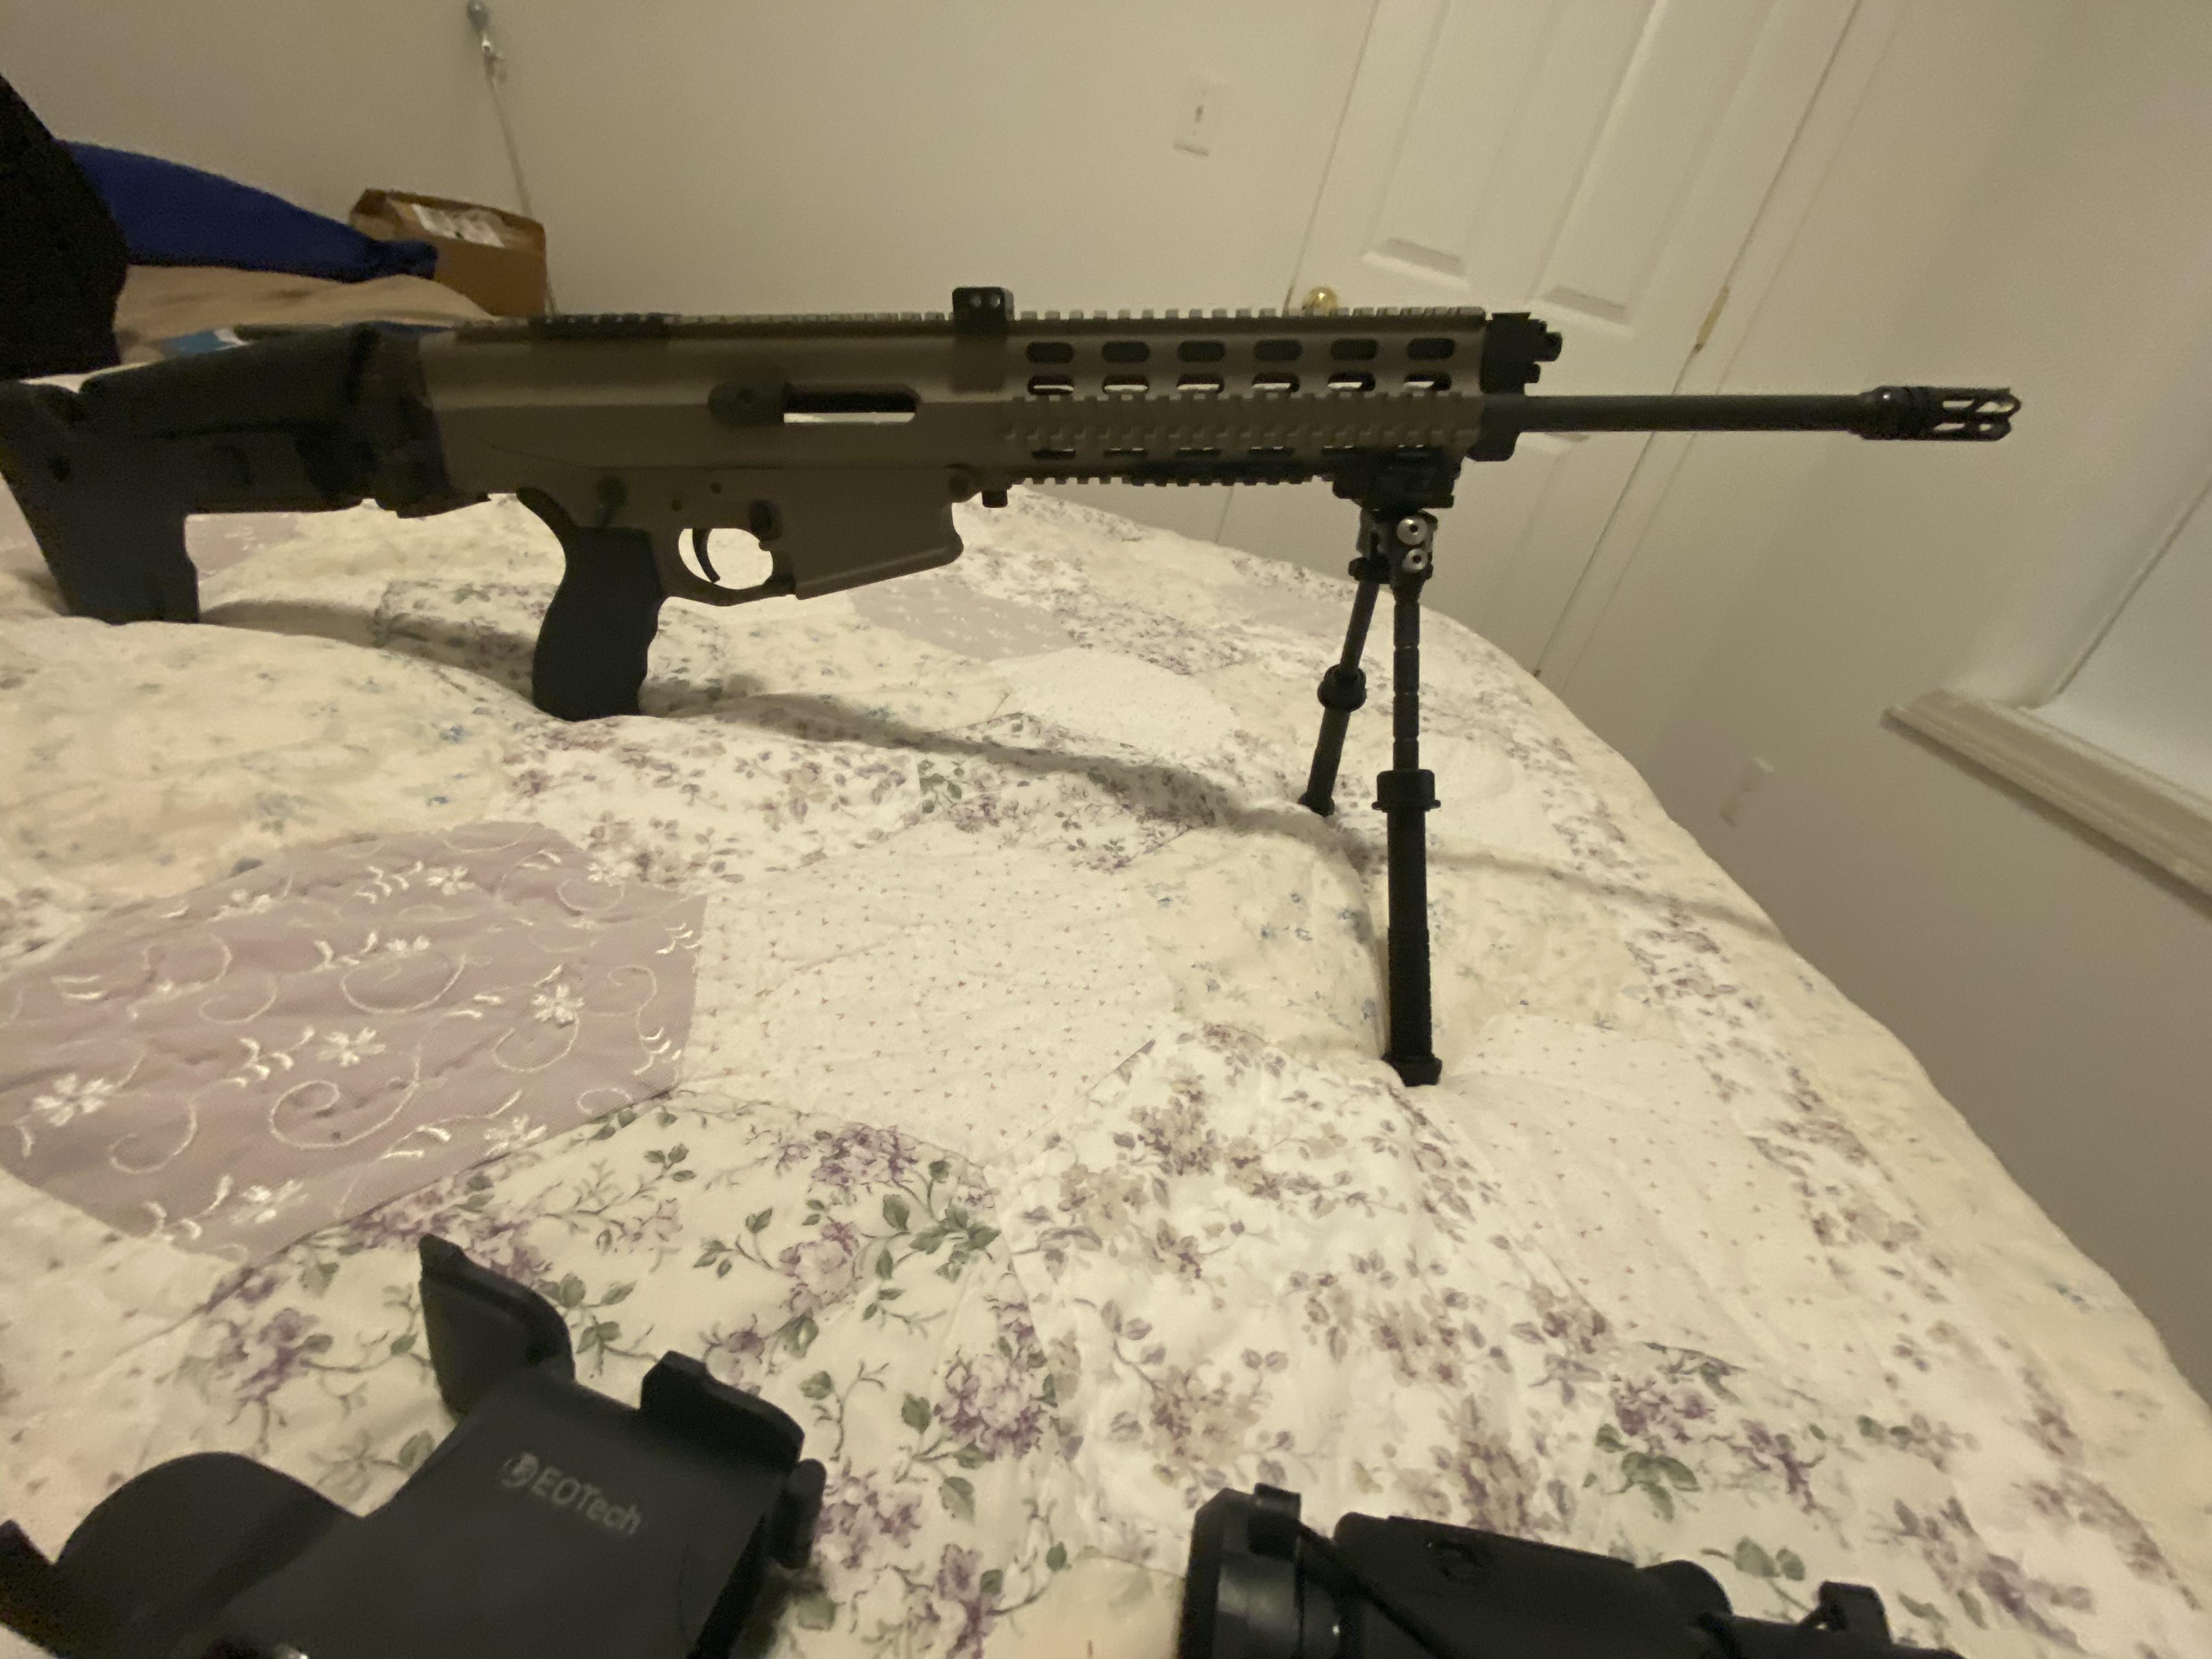 "WTS: XCR-L 5.56 16"" rifle - ezed/acr - plus extras-fb96d272-12ea-4412-96dc-5080e7b52159_1572481967694.jpeg"